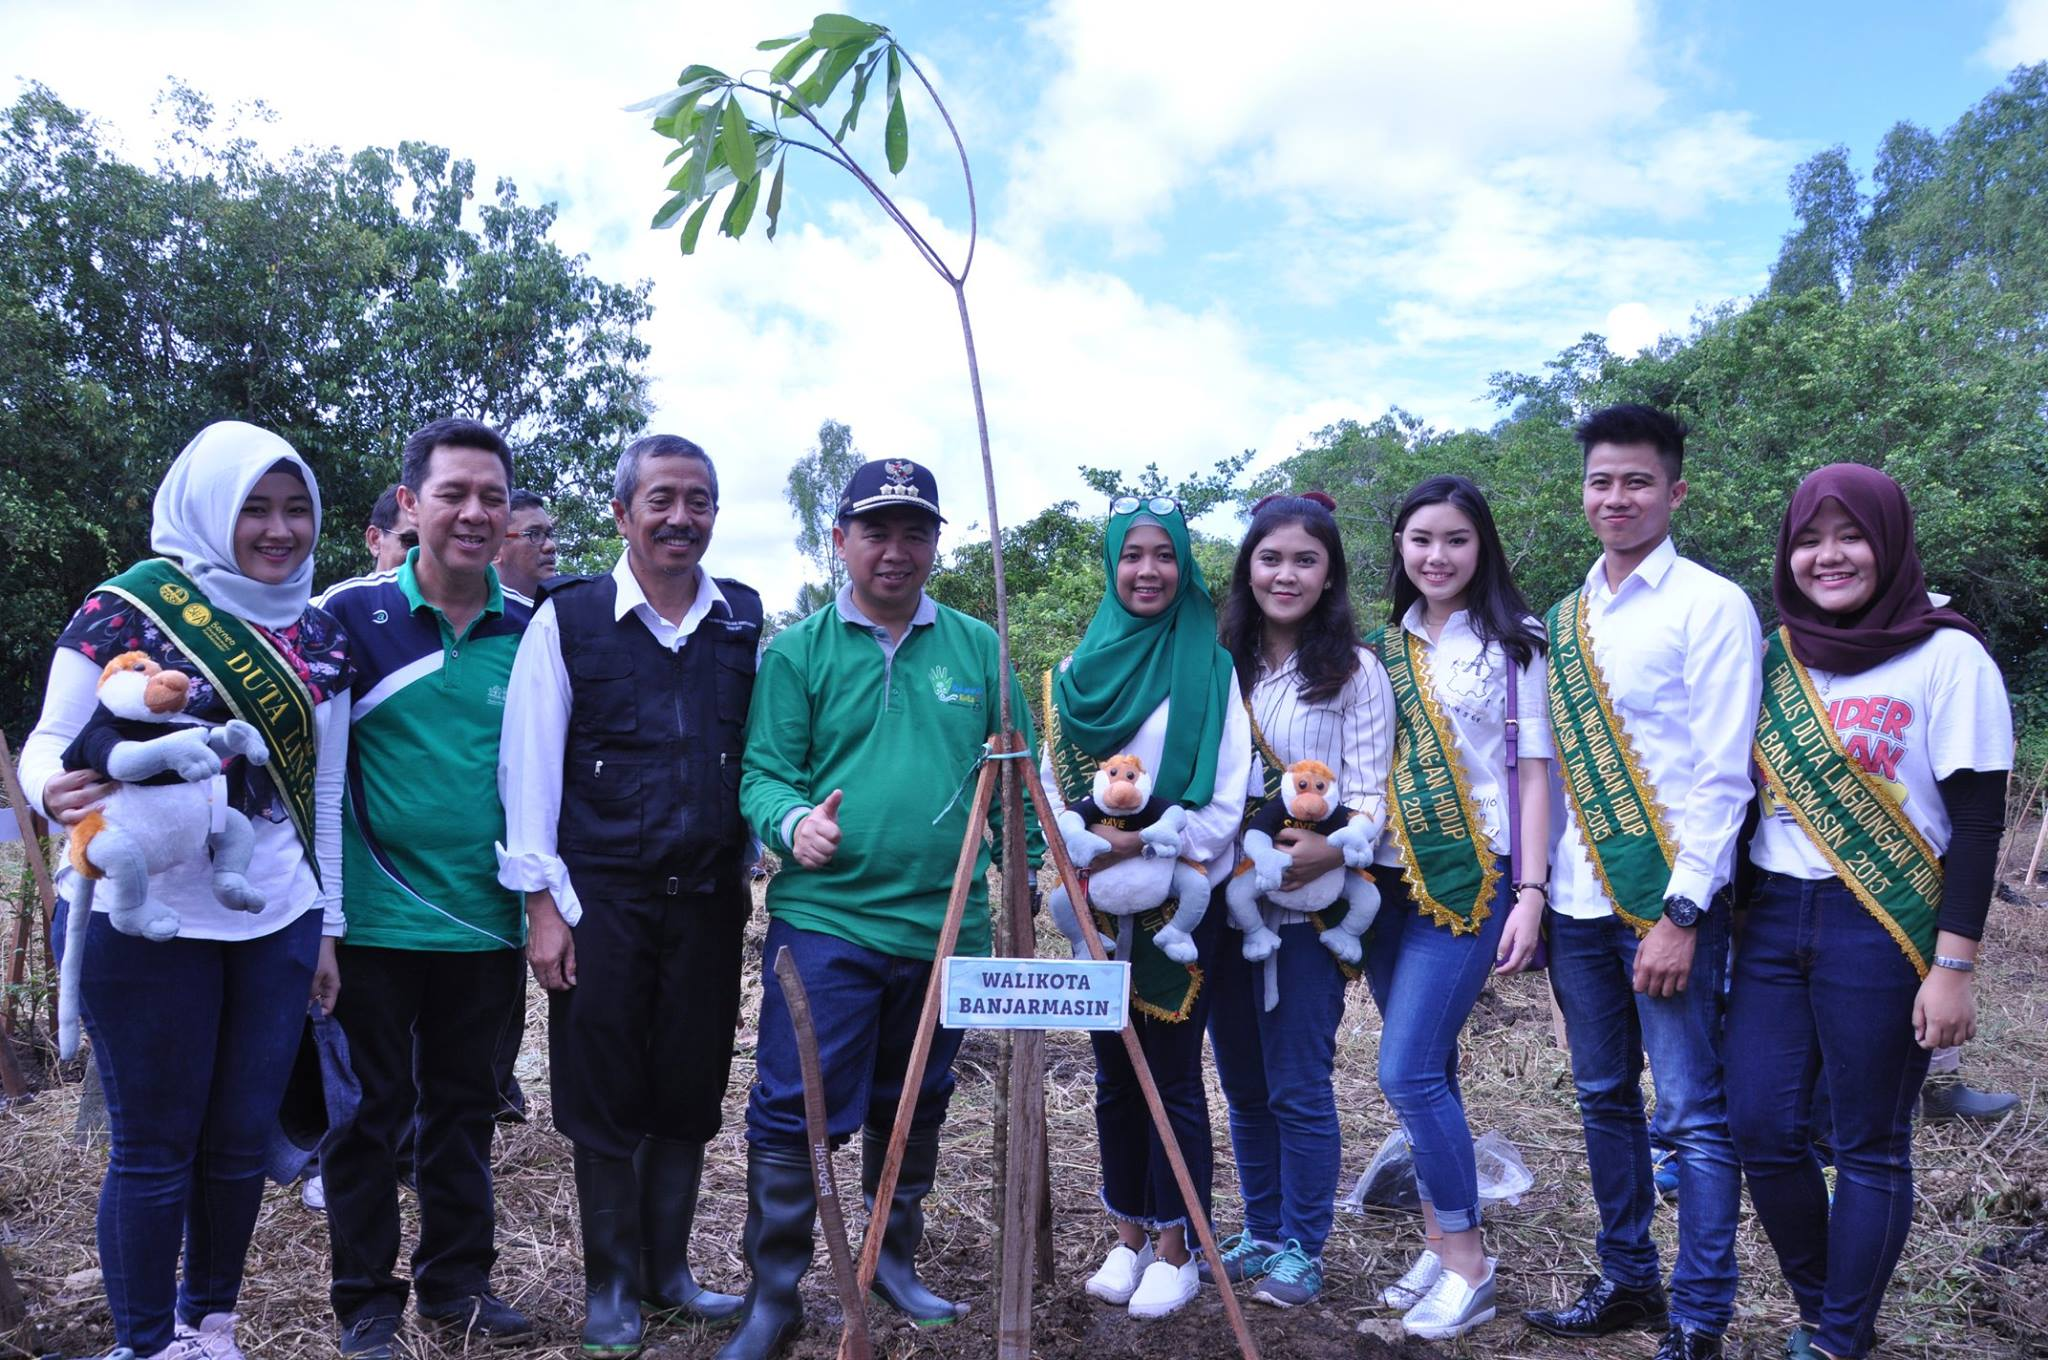 Para Duta Lingkungan Kota Banjarmasin berfoto bersama Walikota Banjarmasin, H. Ibnu Sina selepas penanaman pohon di Pulau Bakut